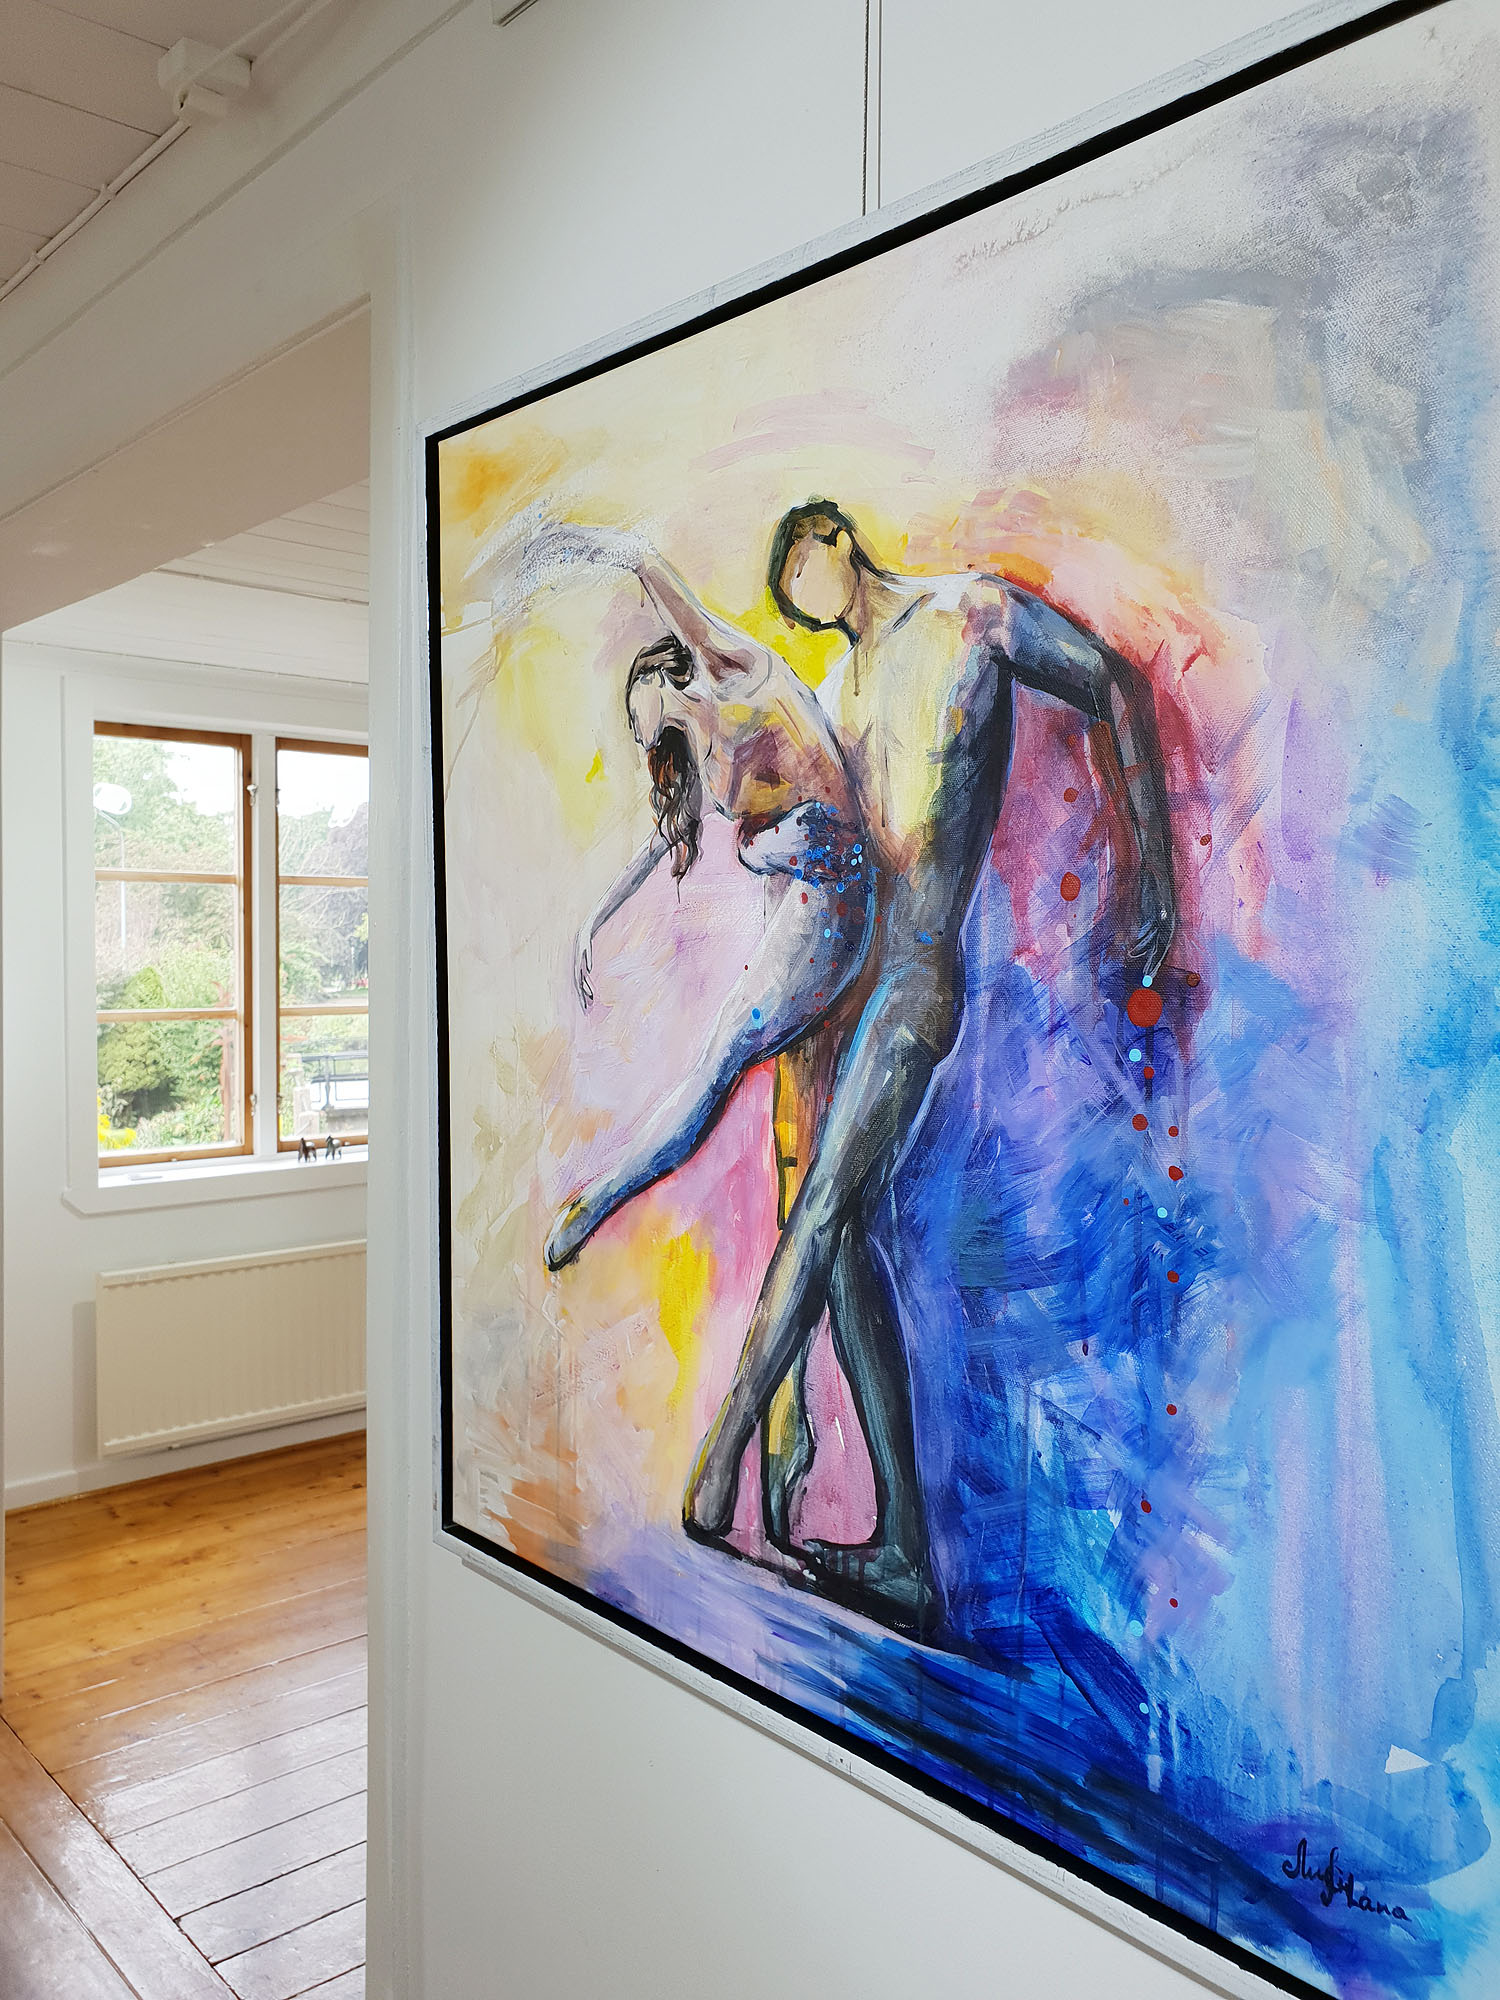 art by Lana-gallery-moroliviagarden-sweden-7